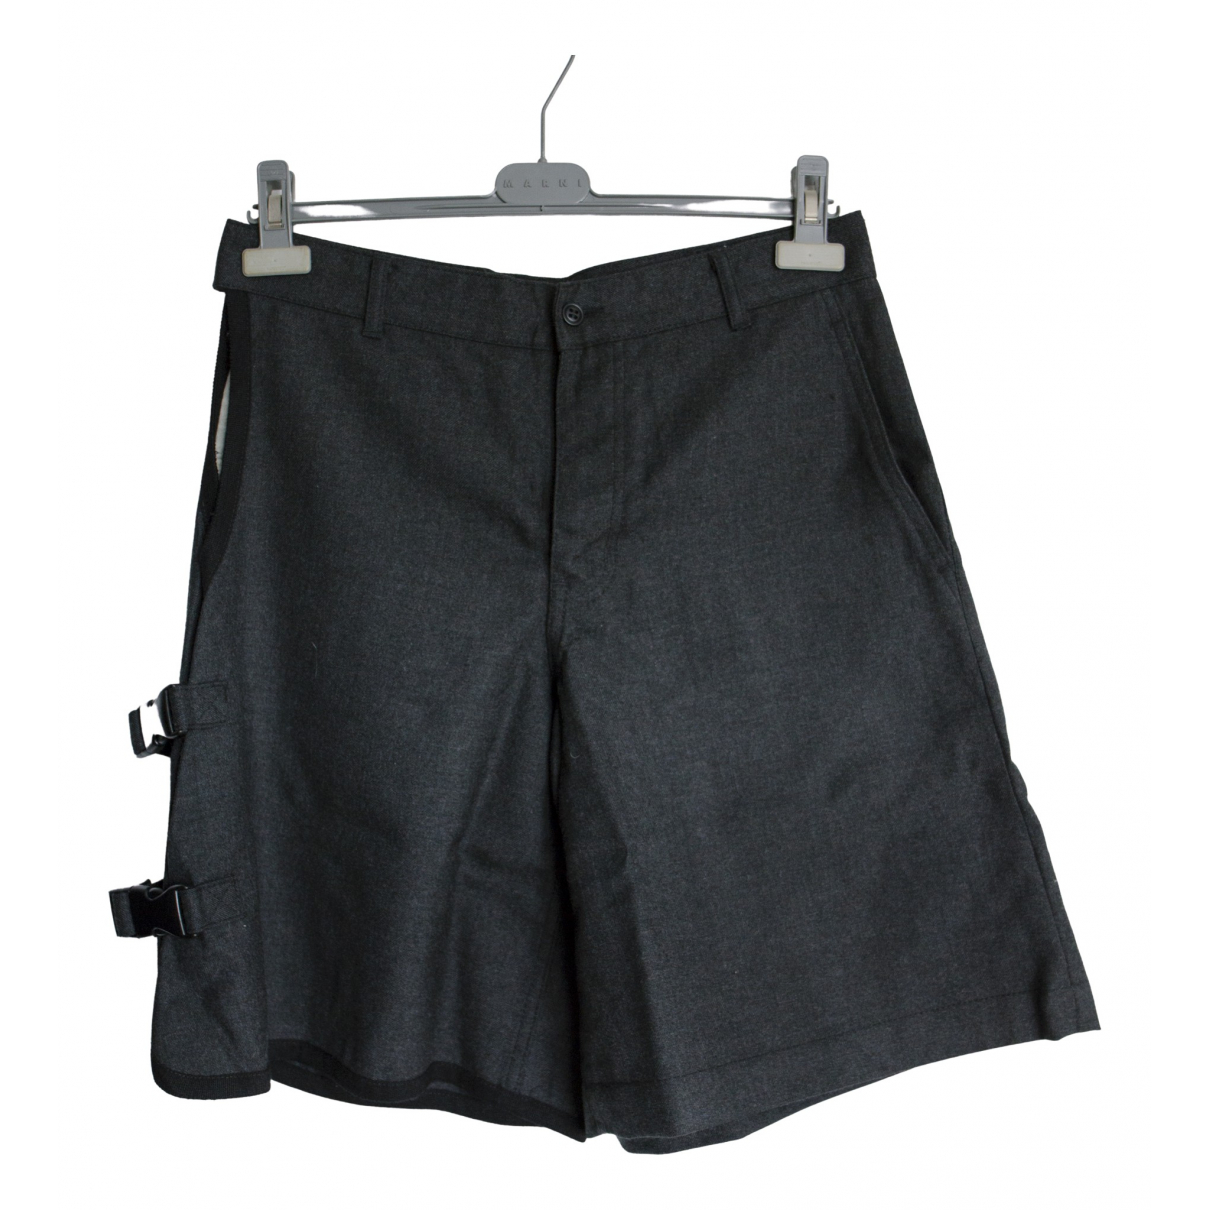 Comme Des Garcons \N Shorts in  Anthrazit Baumwolle